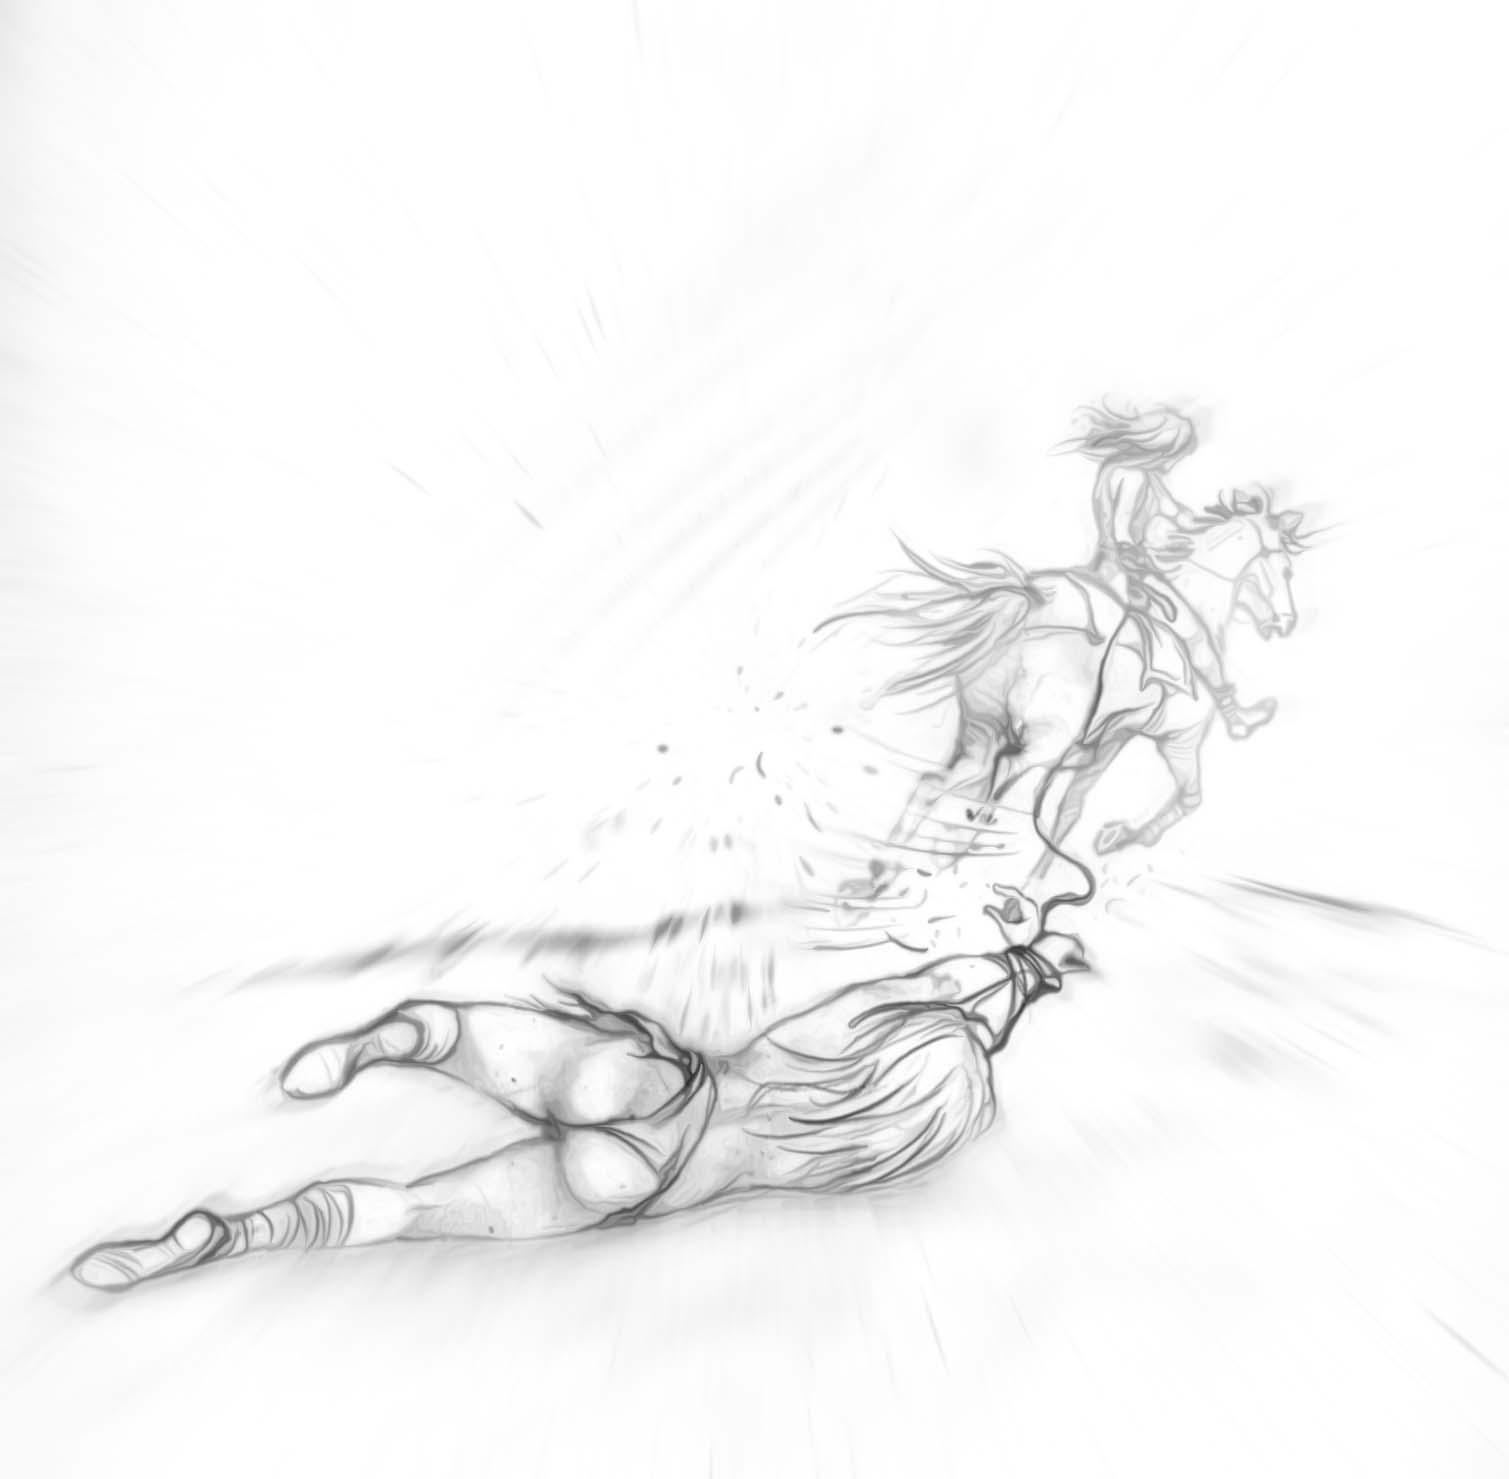 Kelly Osbourne nude/ Келли Осборн голая обнаженная фото эротика